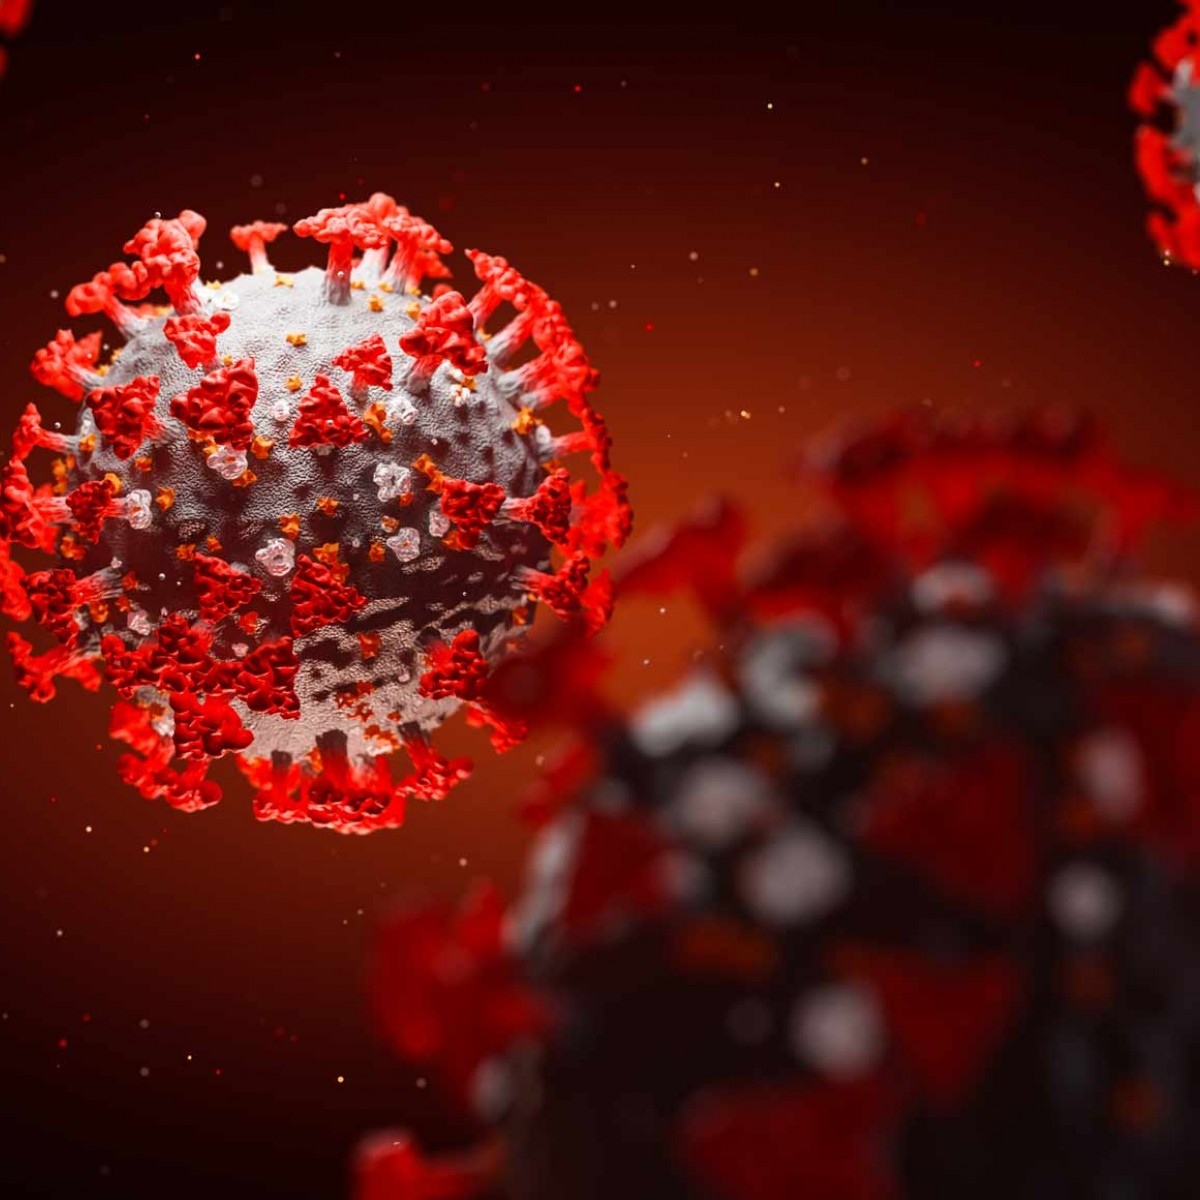 Medownick takes extra precautions to prevent the spread of COVID-19 – the coronavirus